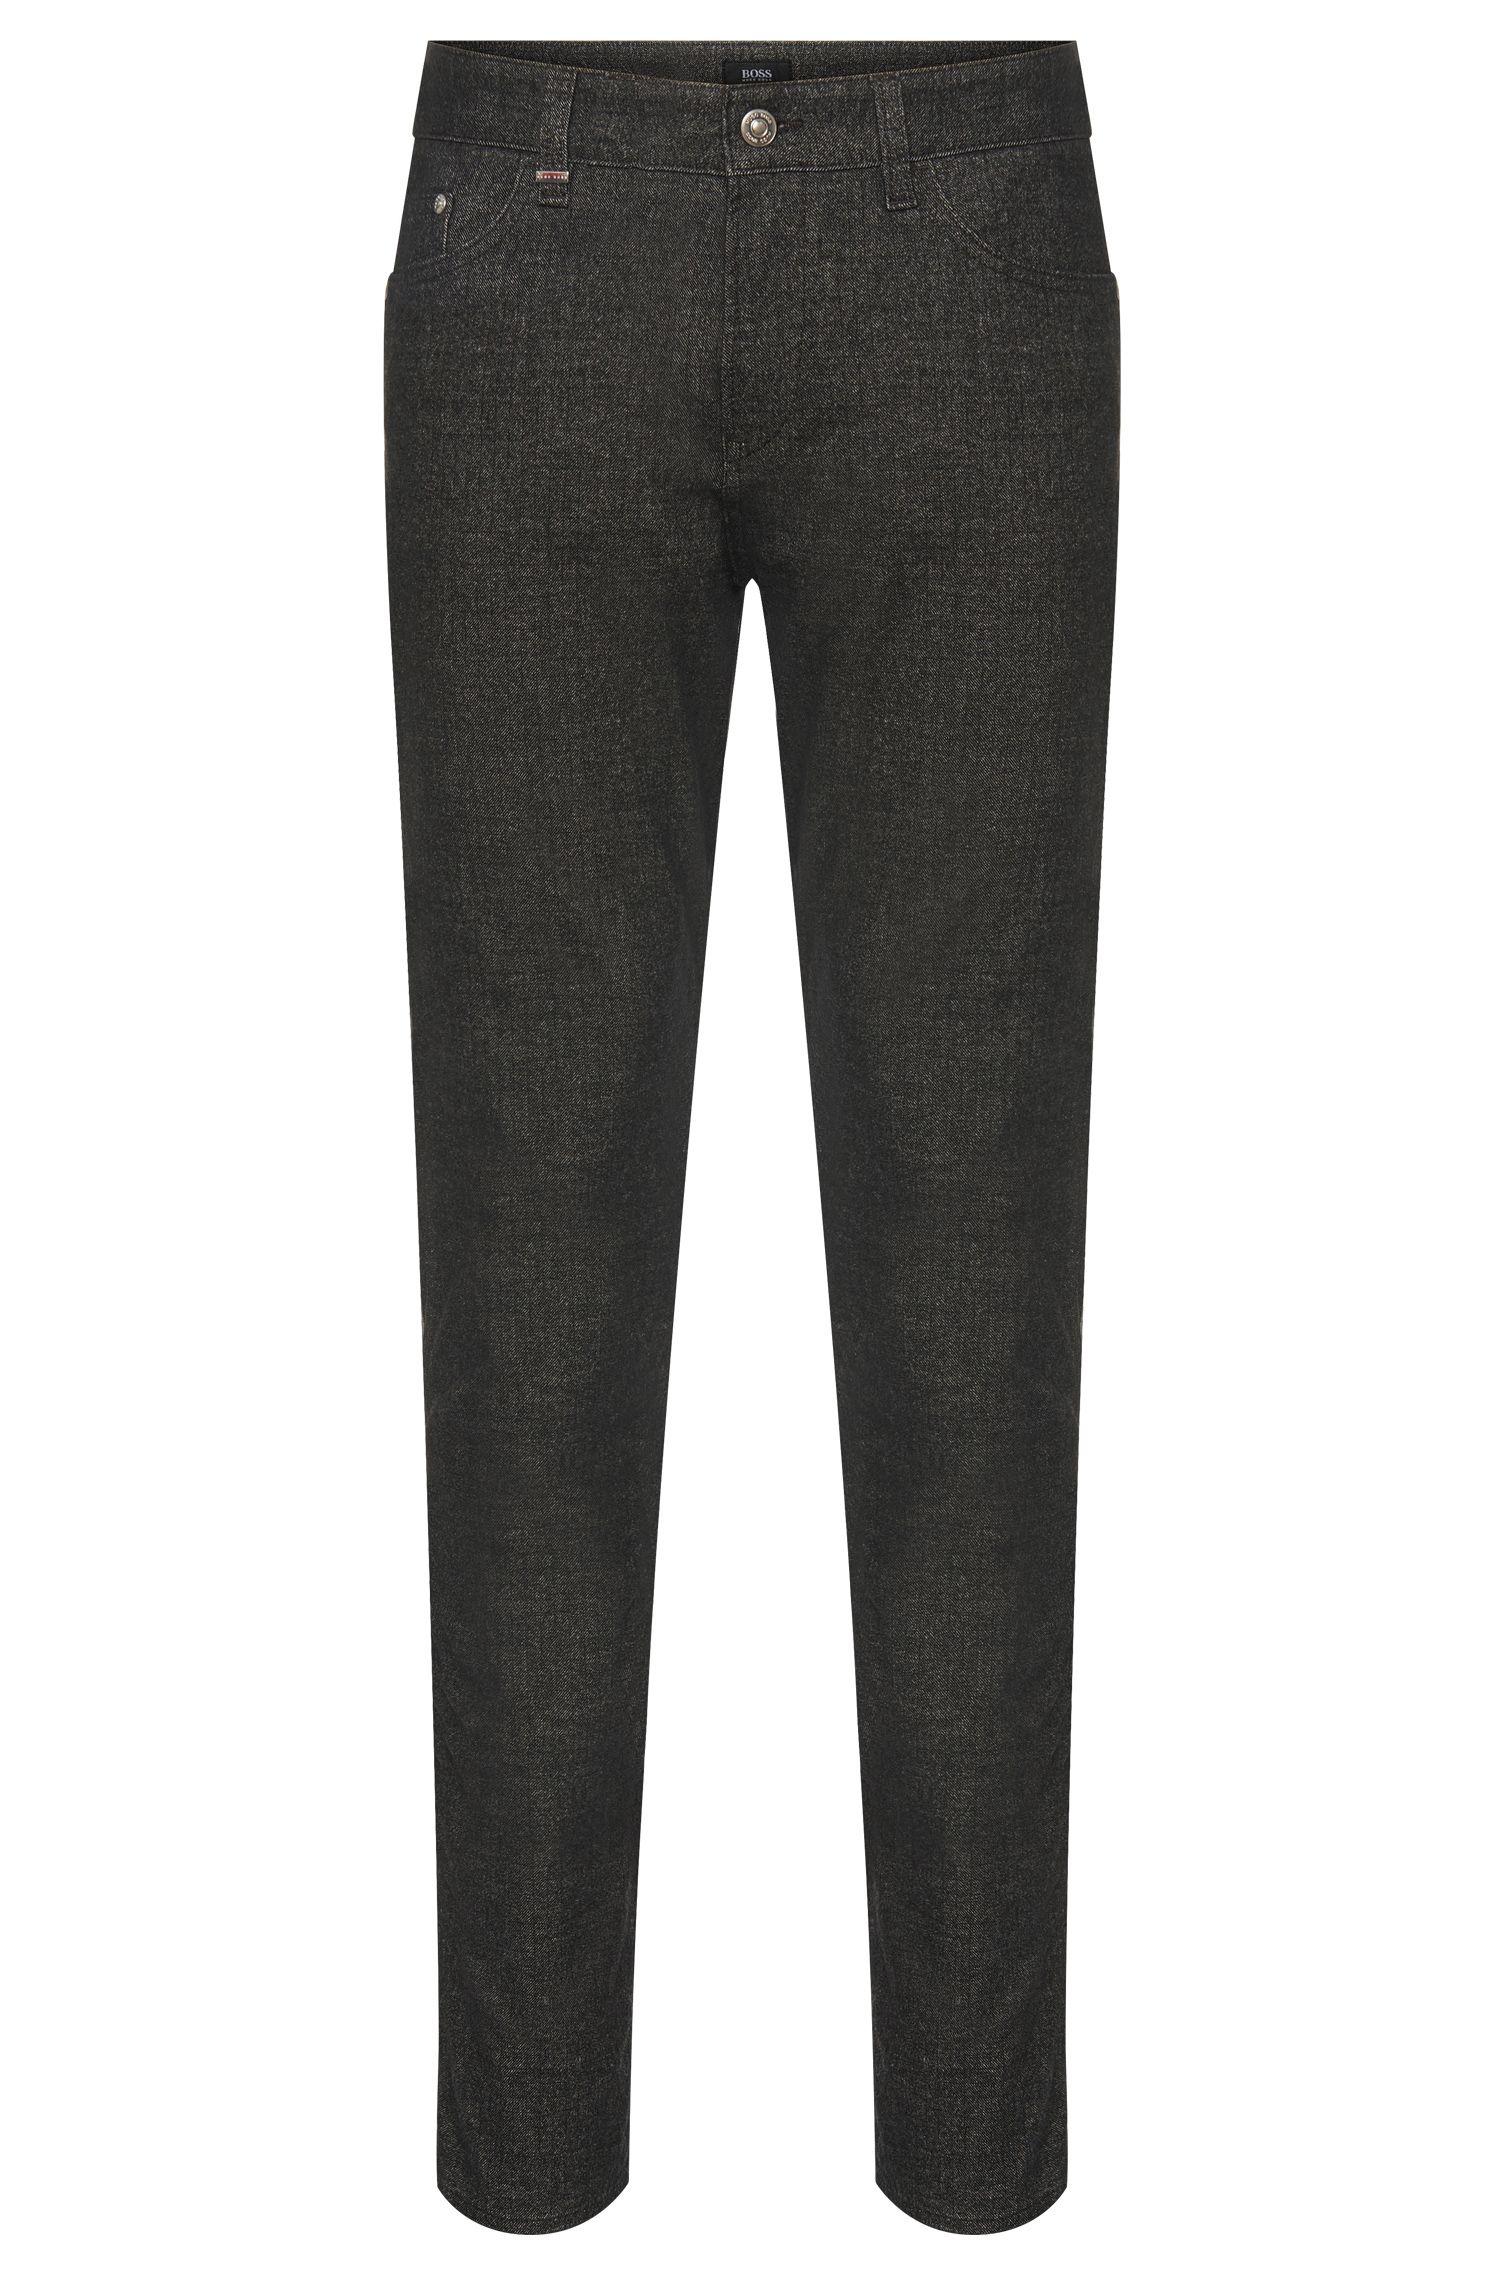 Mottled slim-fit trousers in cotton blend: 'Delaware3-20'